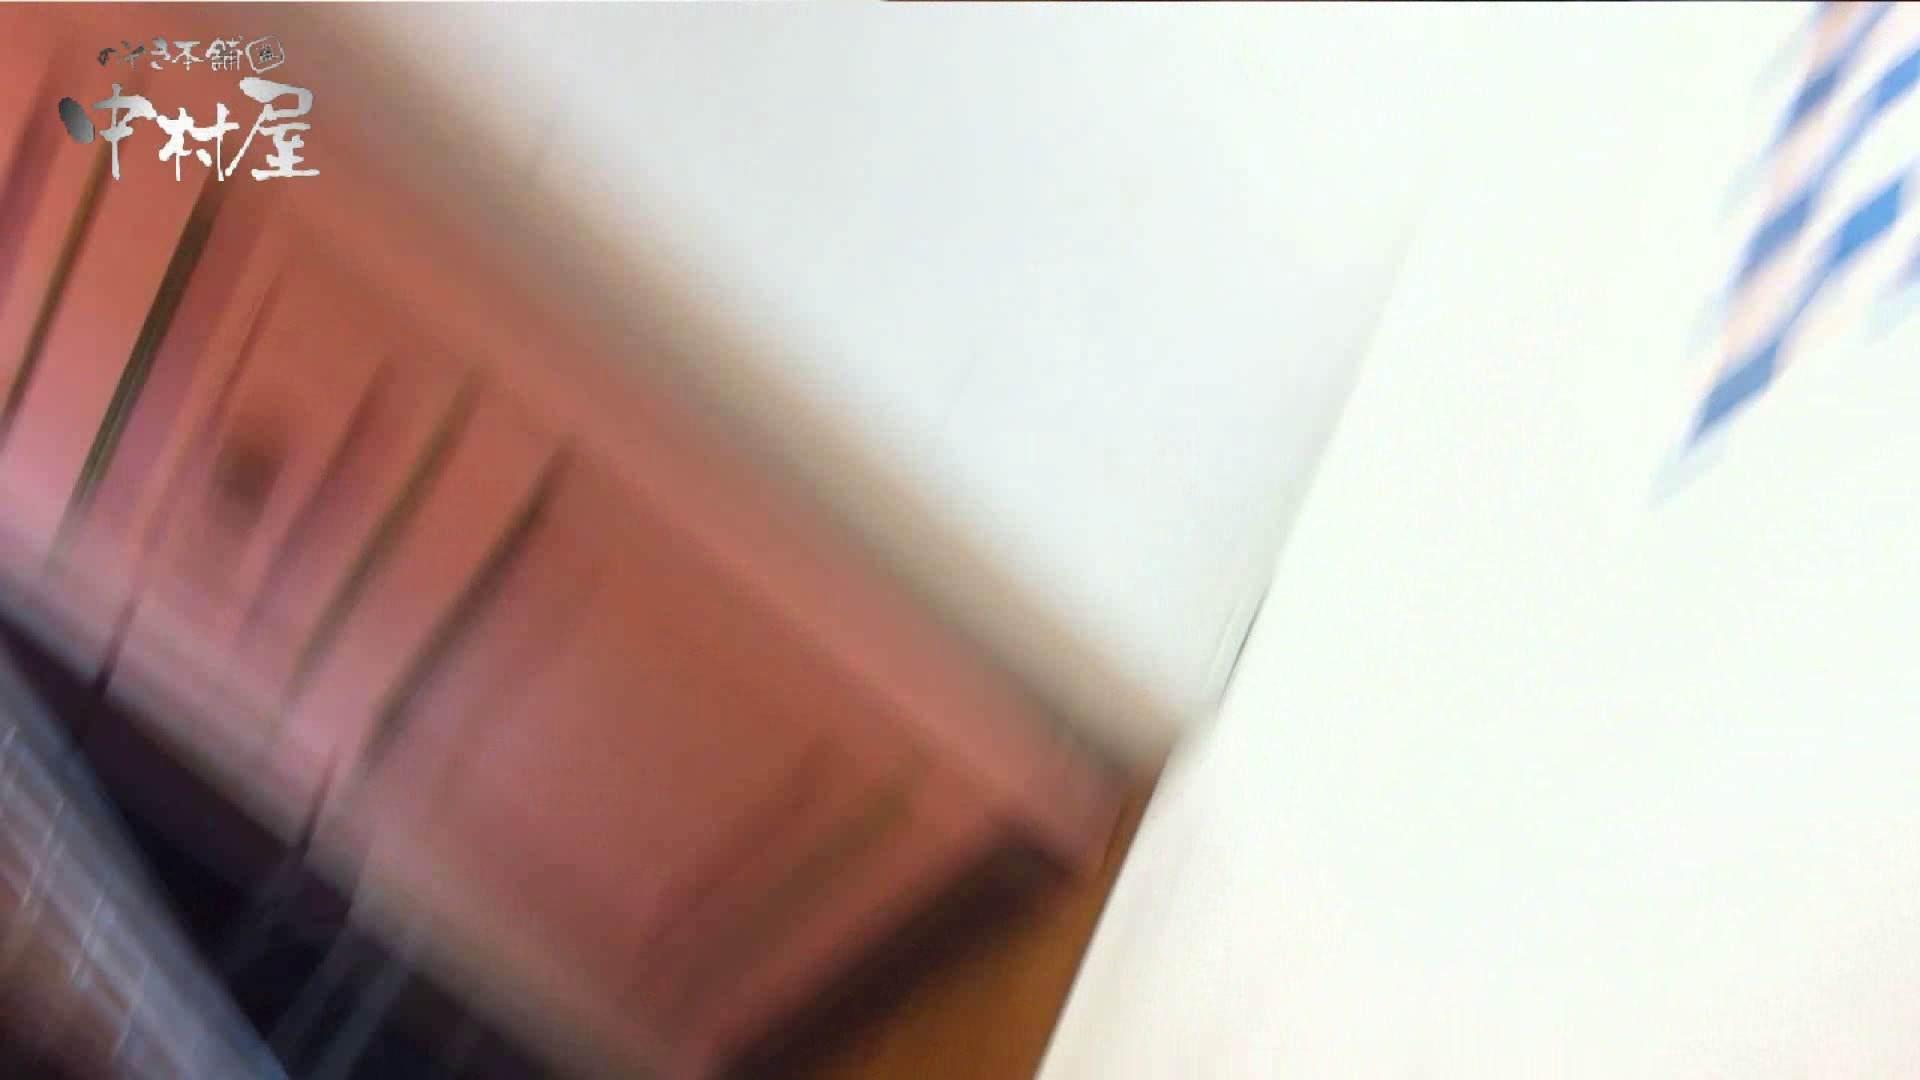 vol.43 可愛いカリスマ店員限定‼胸チラ&パンチラ 美脚おねーさんの胸元ゲット! パンチラ ヌード画像 76PIX 43